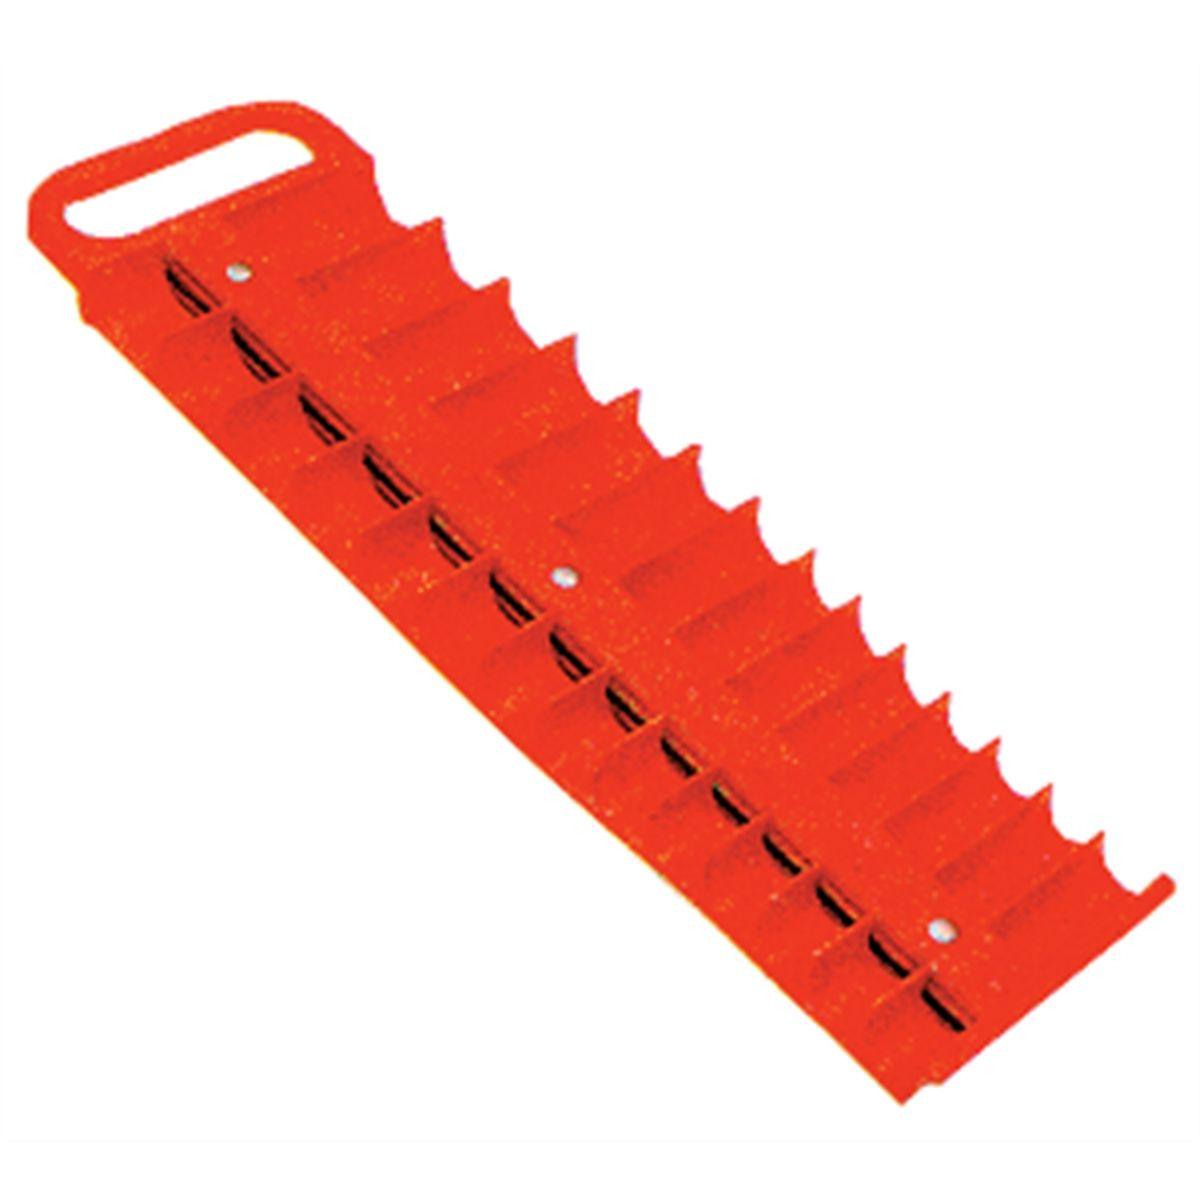 LISLE Large Magnetic 3//8�� Socket Tray Red 40200